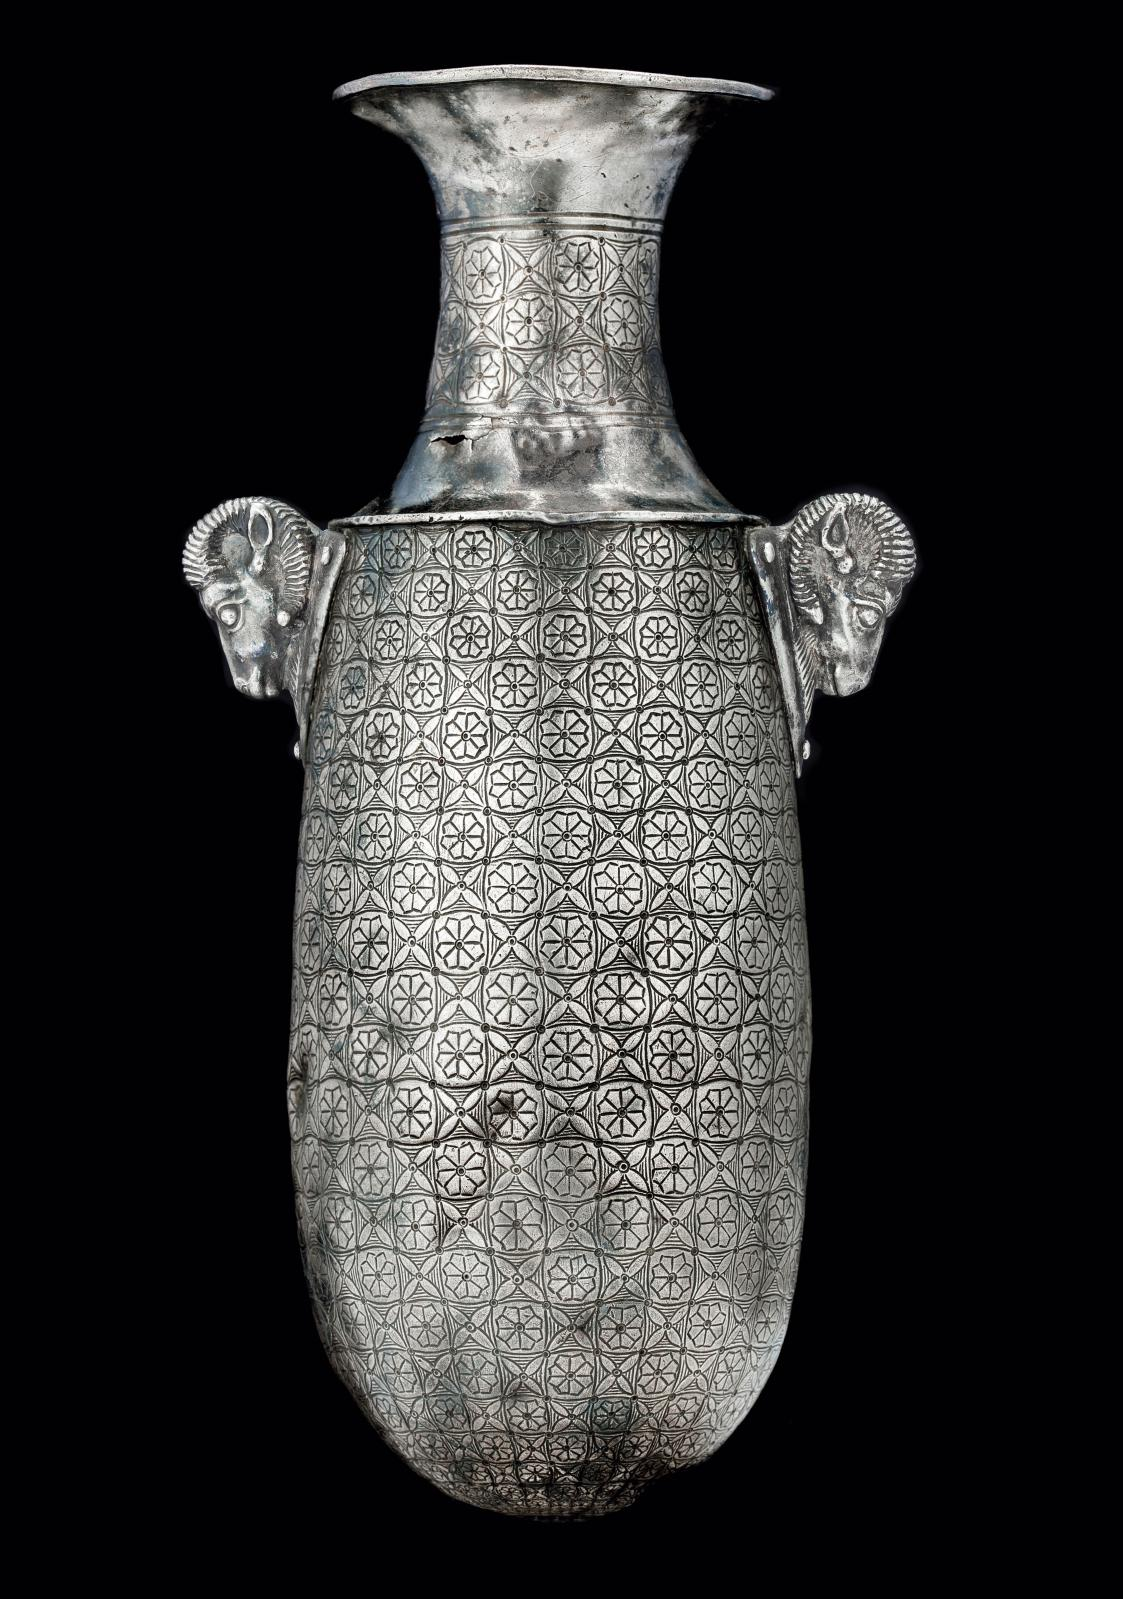 Alabastre, empire achéménide, Vesiècle av. J.-C, argent,h.26.1cm.Galerie David Aaron. Courtesy galerie David Aaron